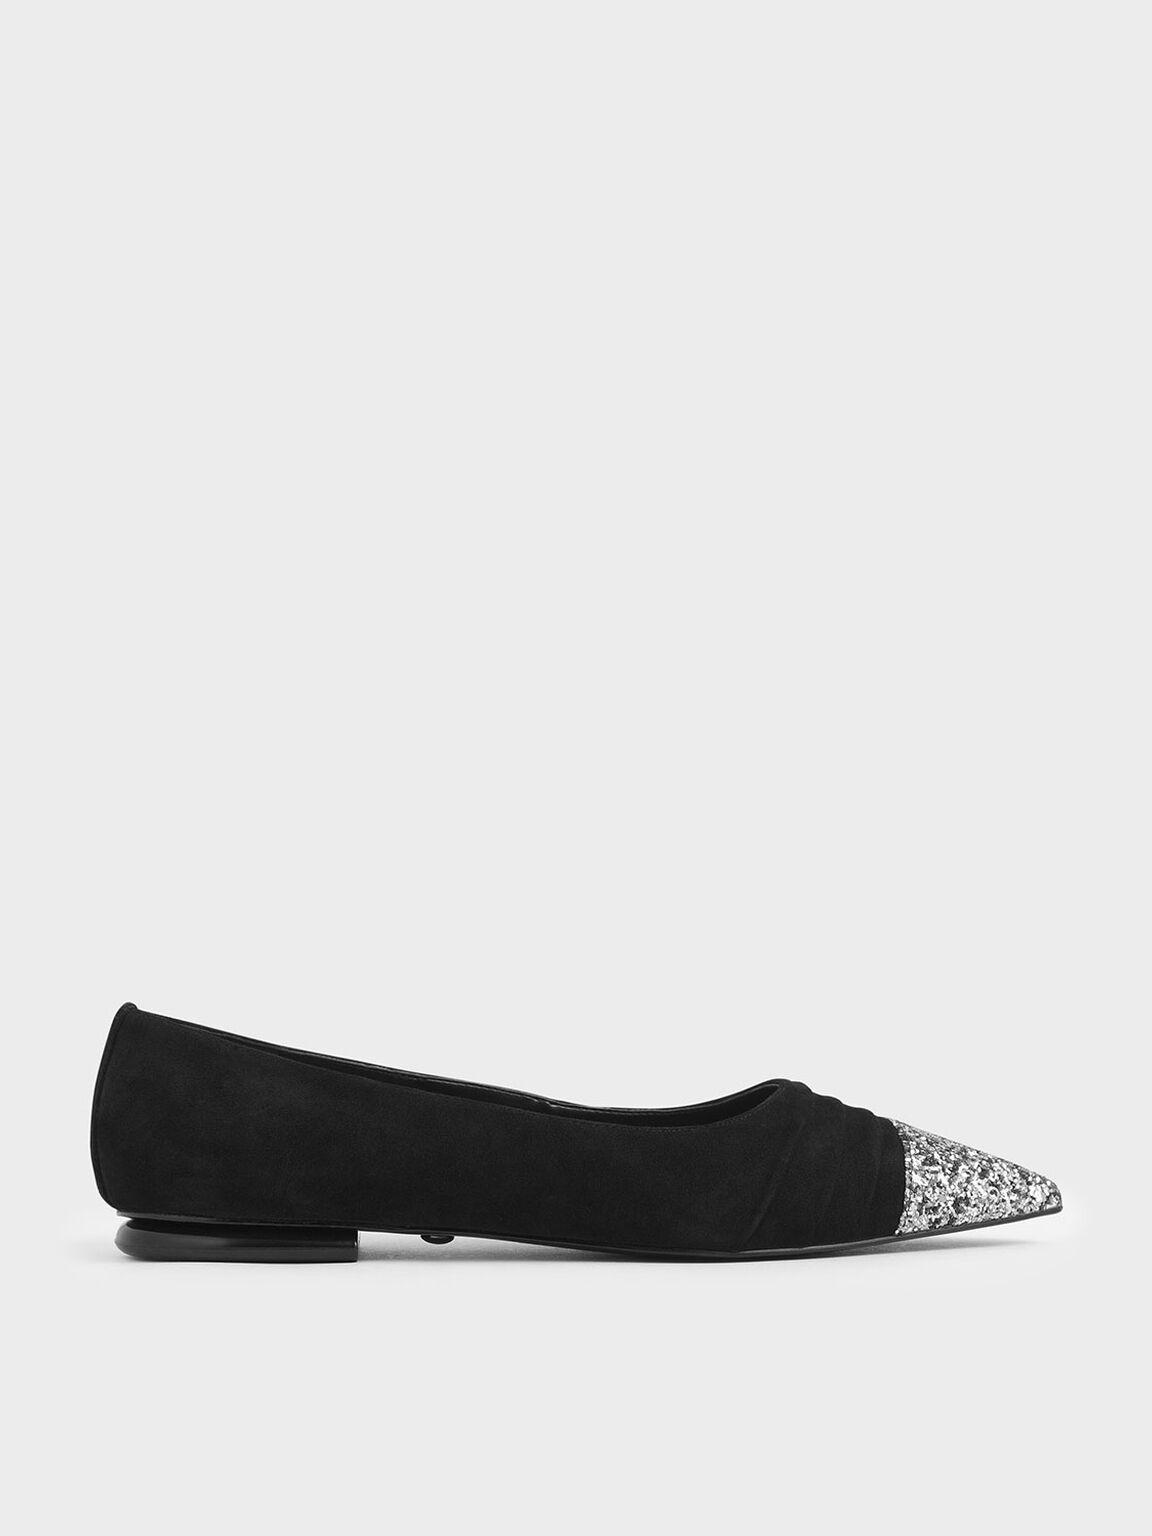 Glitter Ballerina Flats (Kid Suede), Black, hi-res